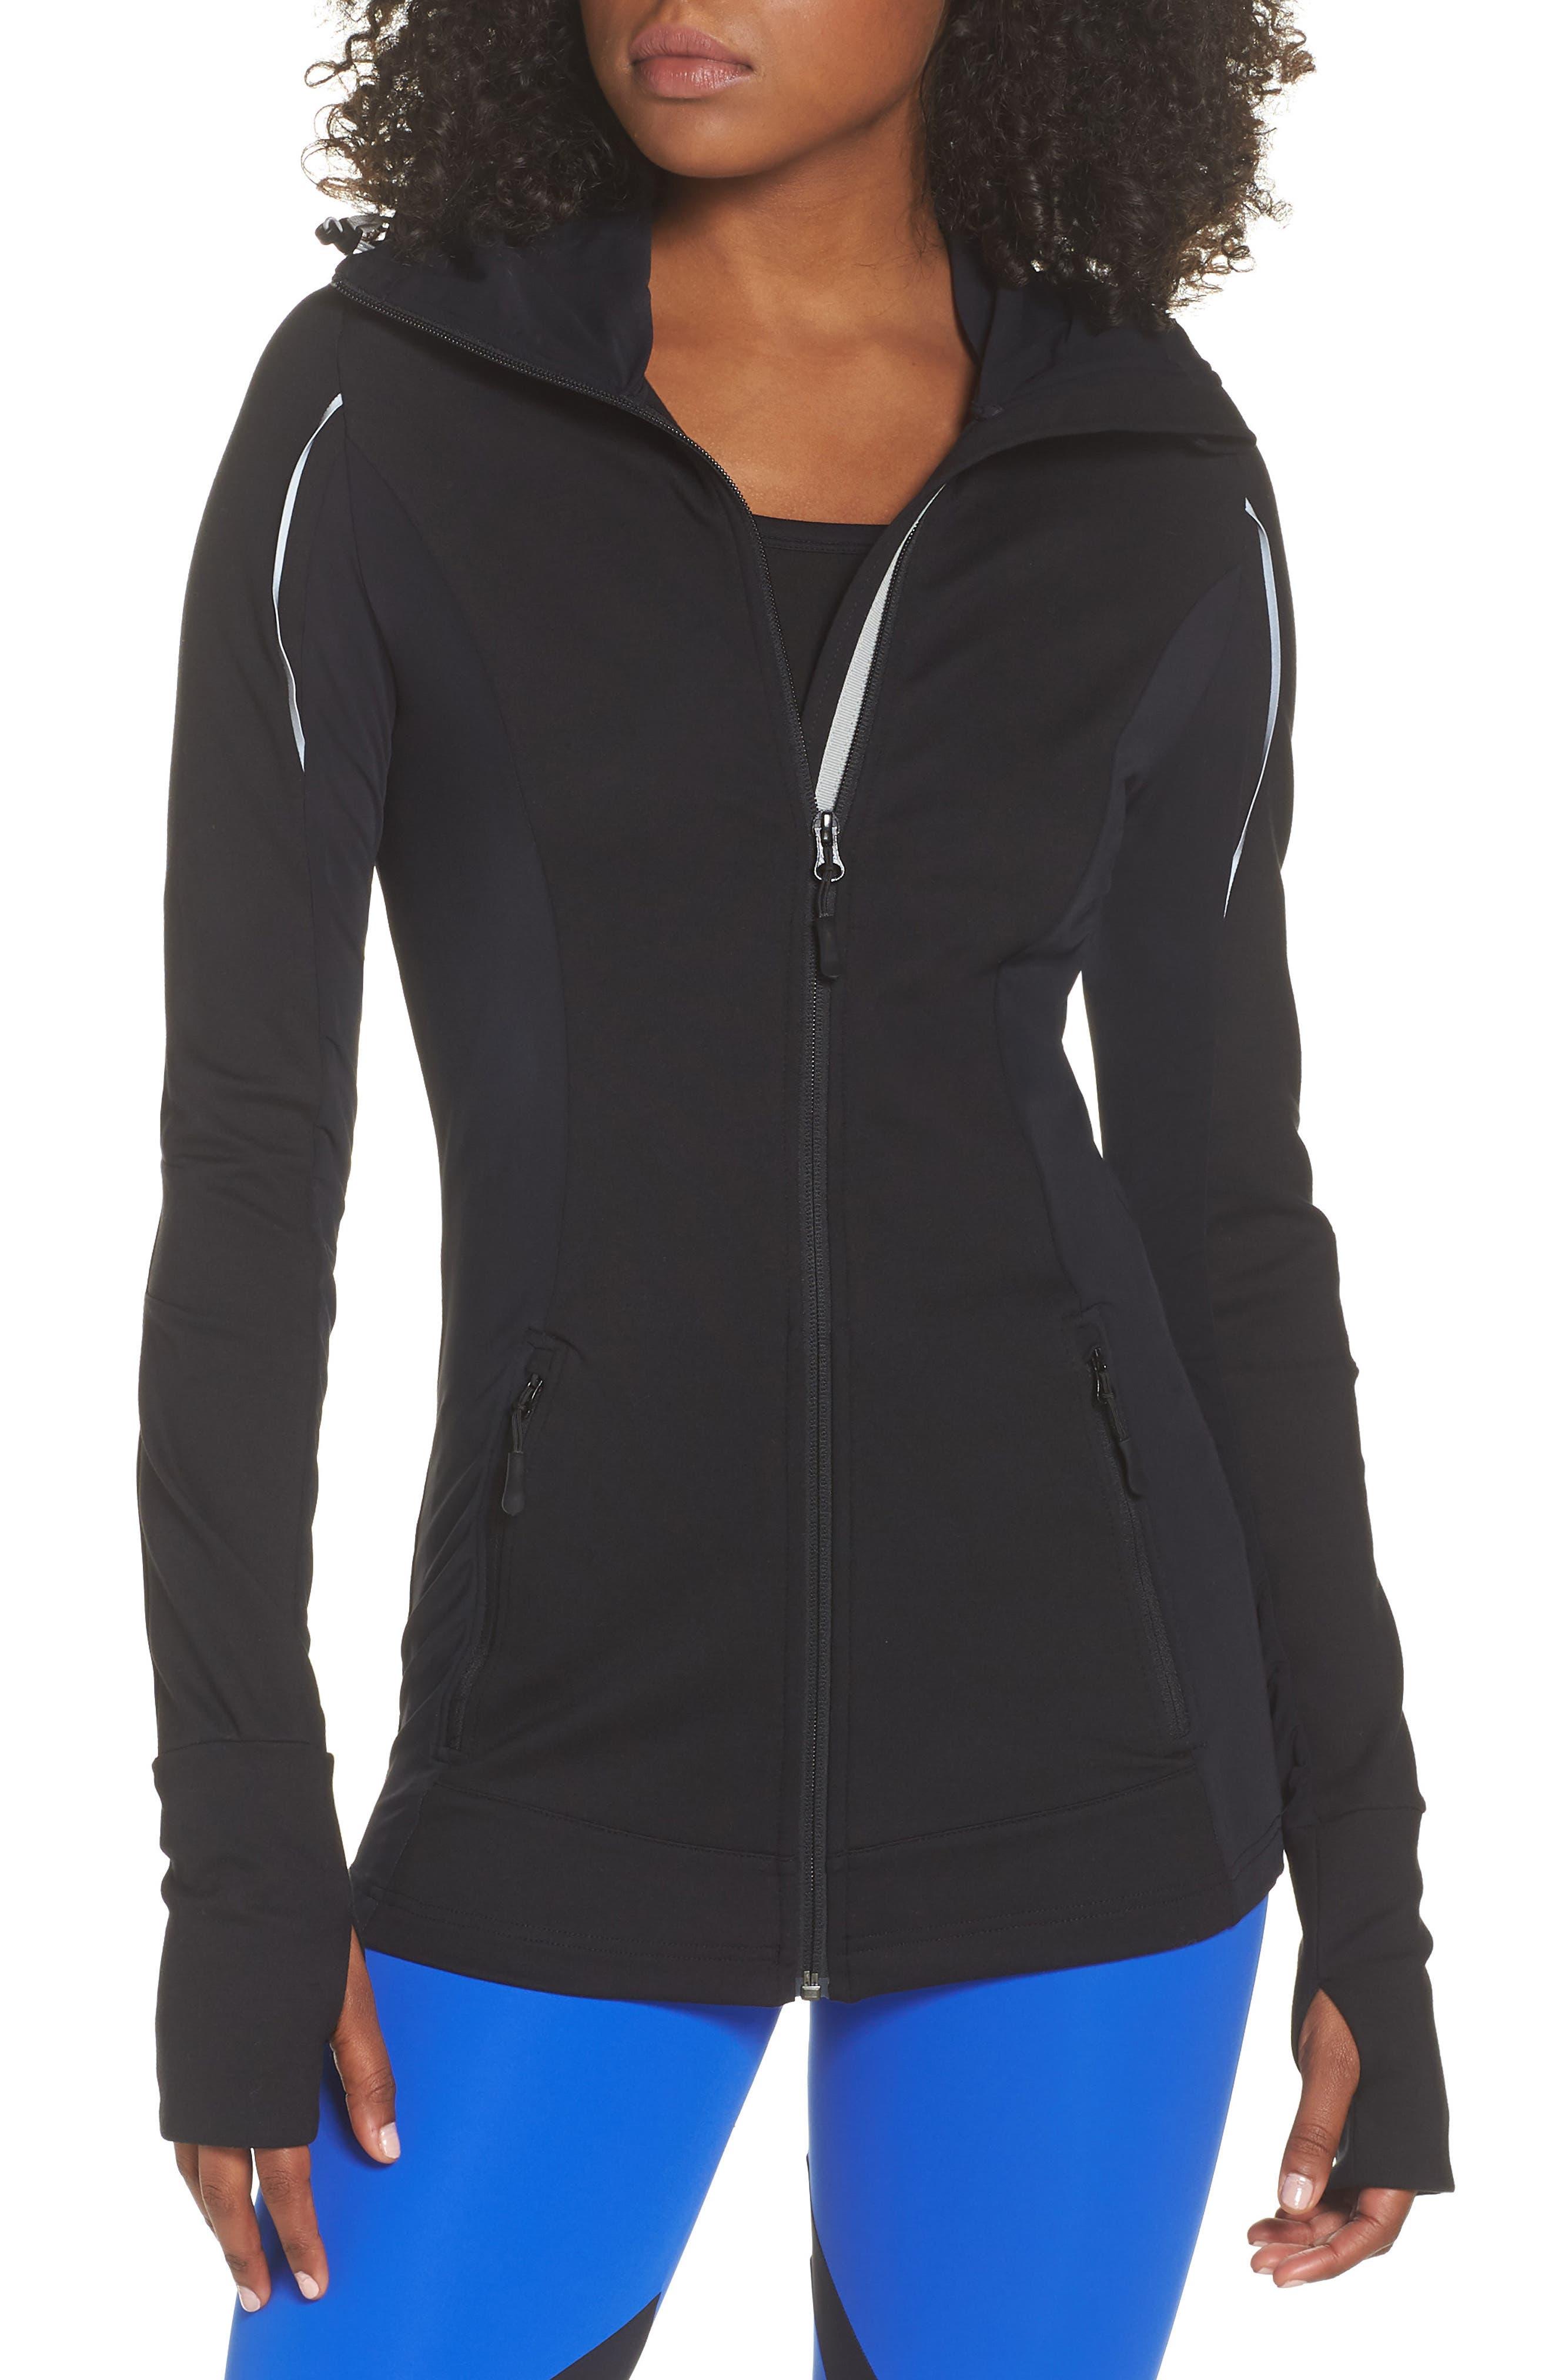 BoomBoom Athletica Zip Hoodie,                         Main,                         color, BLACK